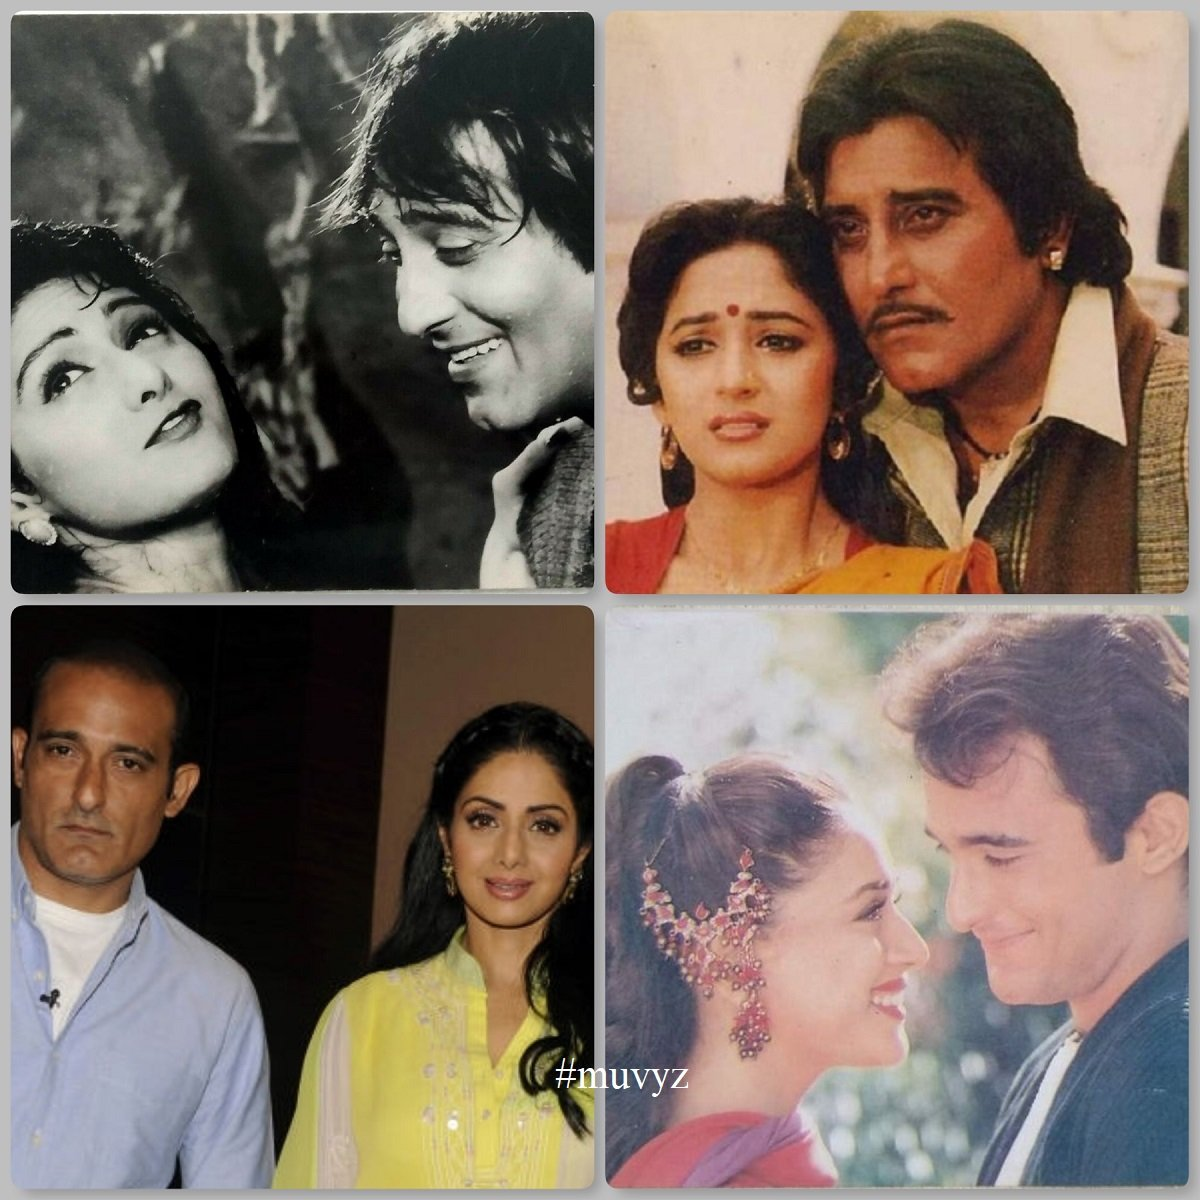 #VinodKhanna #Sridevi #MadhuriDixit #AkshayeKhanna  #BollywoodFlashback #FatherSon #muvyz #muvyz111919